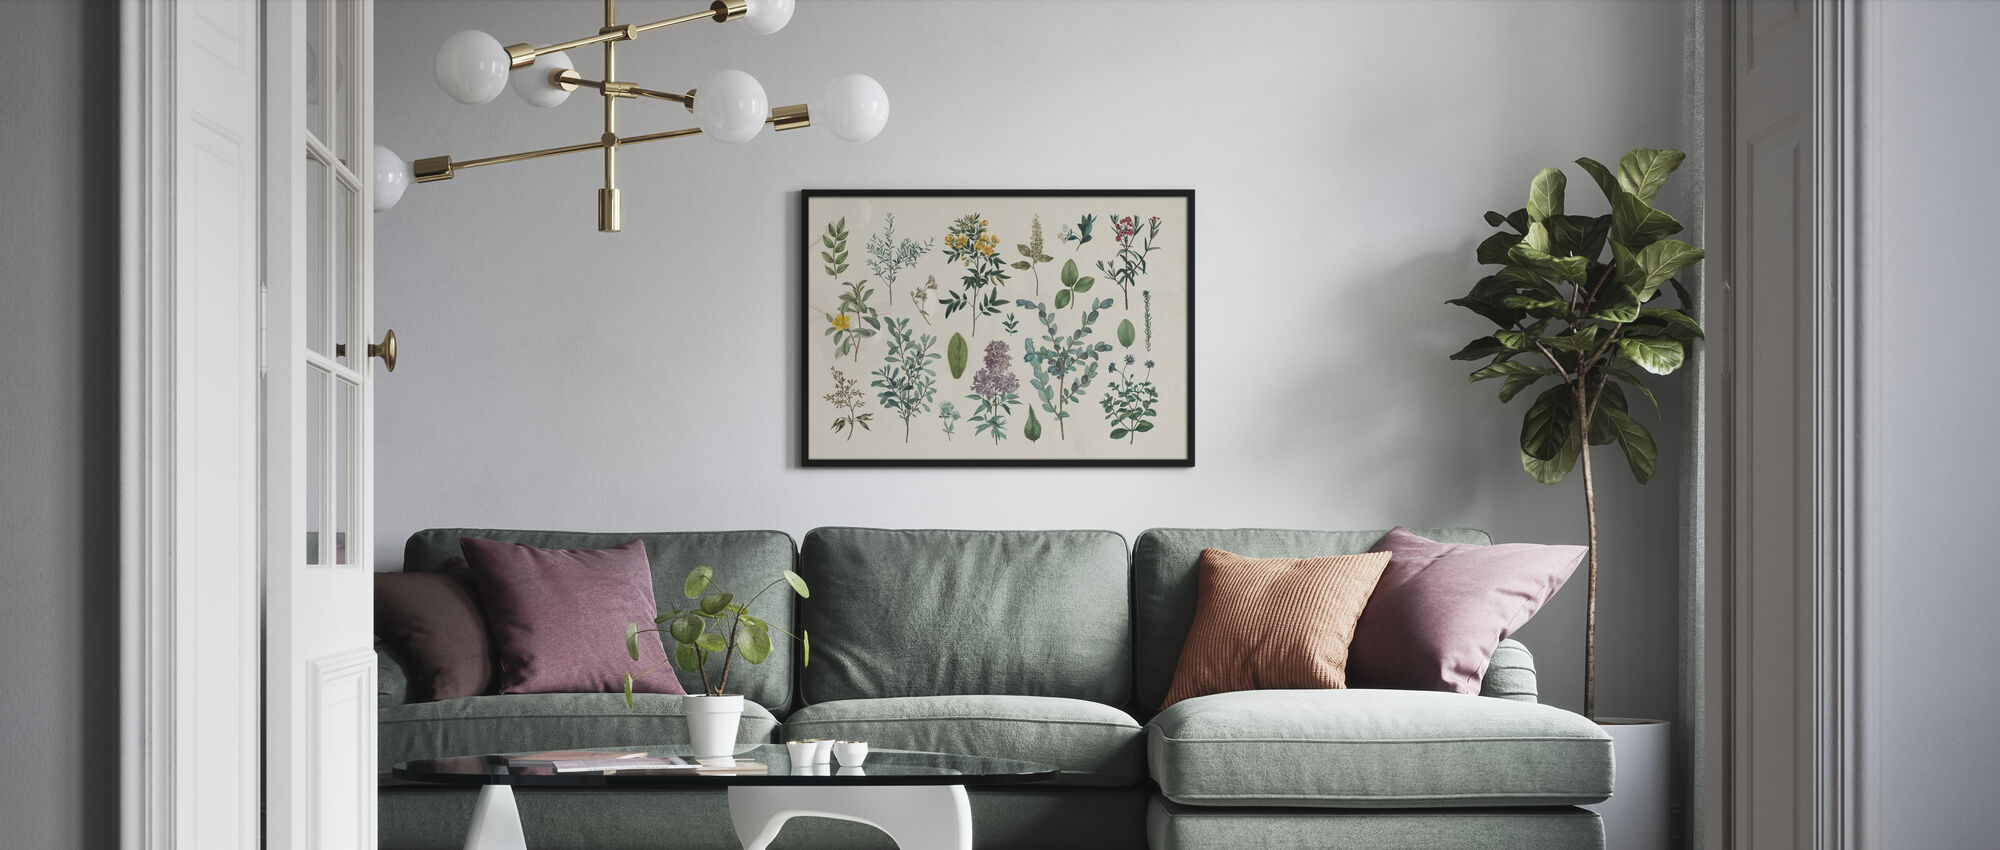 Victorian Garden IV - Poster - Living Room